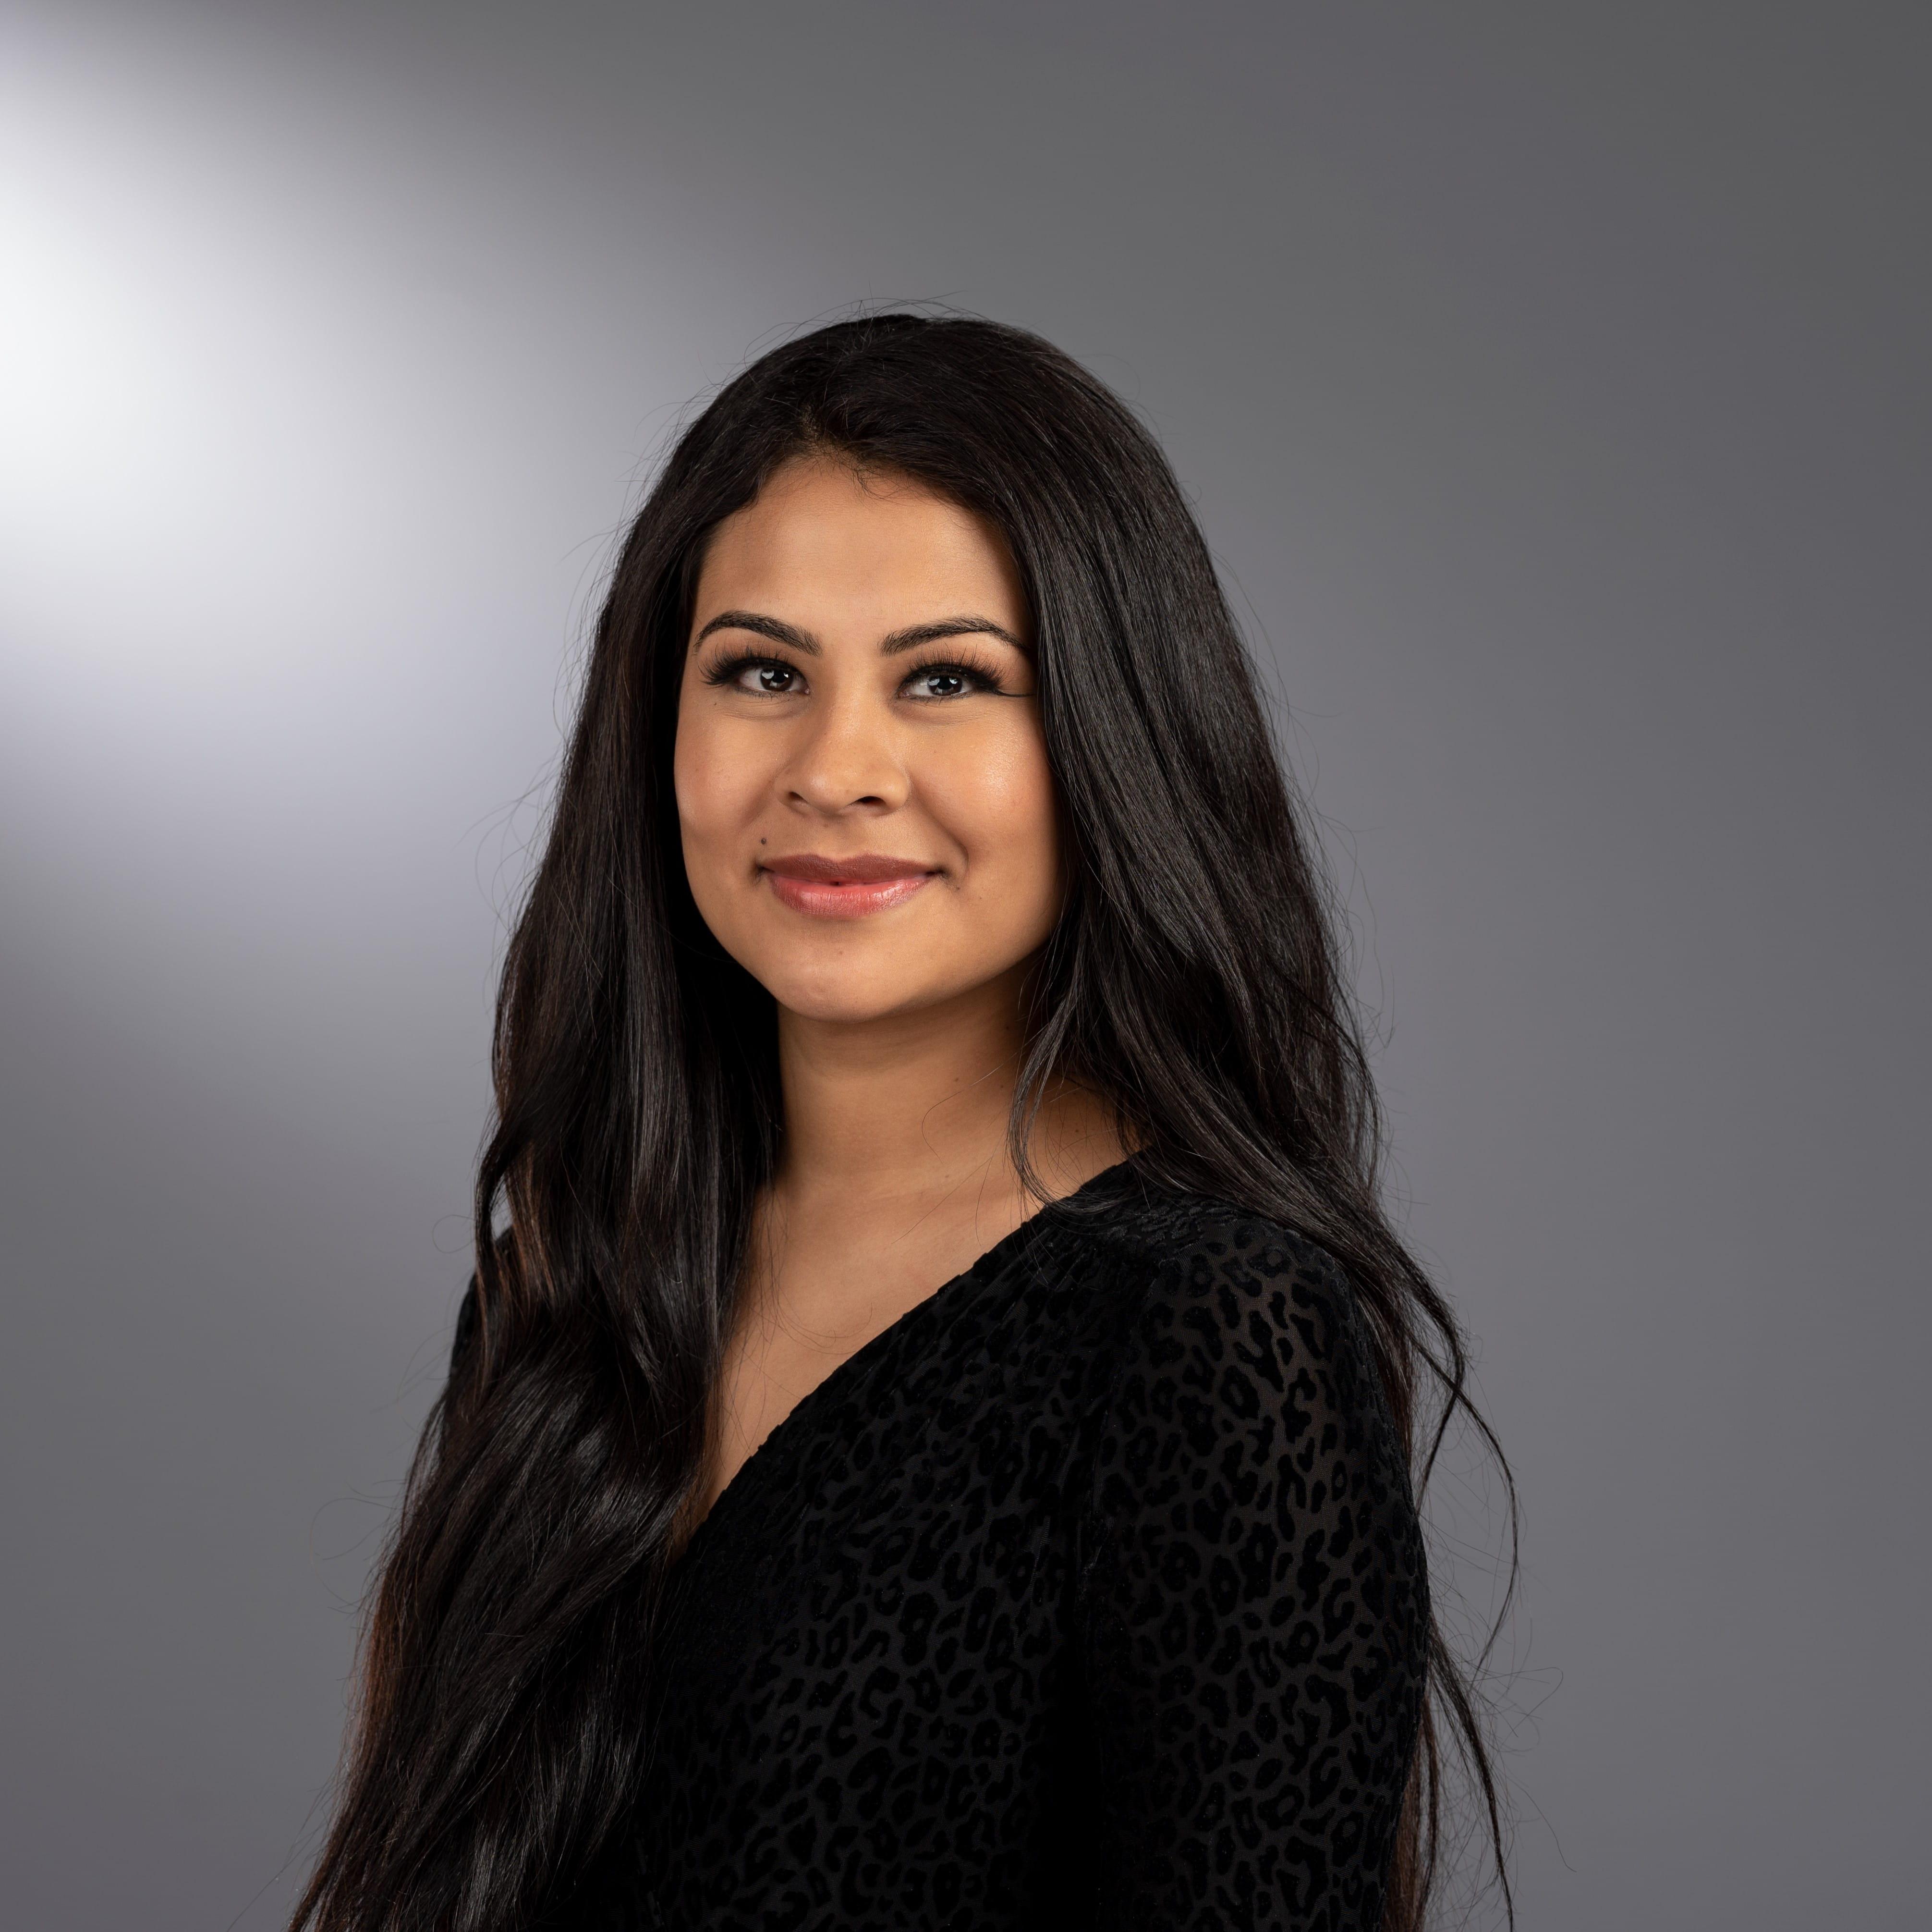 Headshot of Tania Fernandez